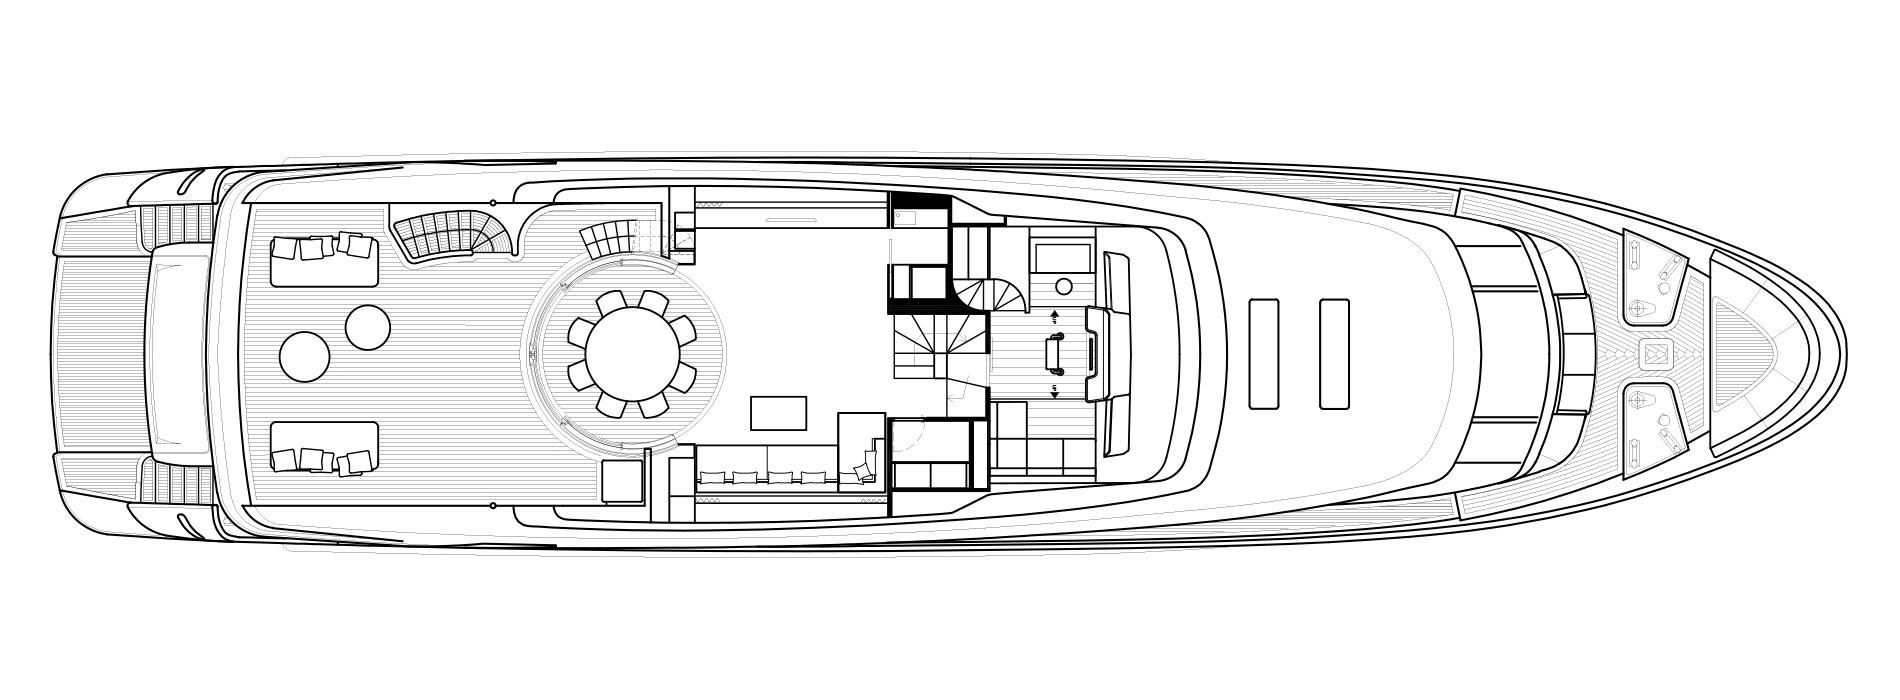 Sanlorenzo Yachts SD112 Bерхний палуба версия B